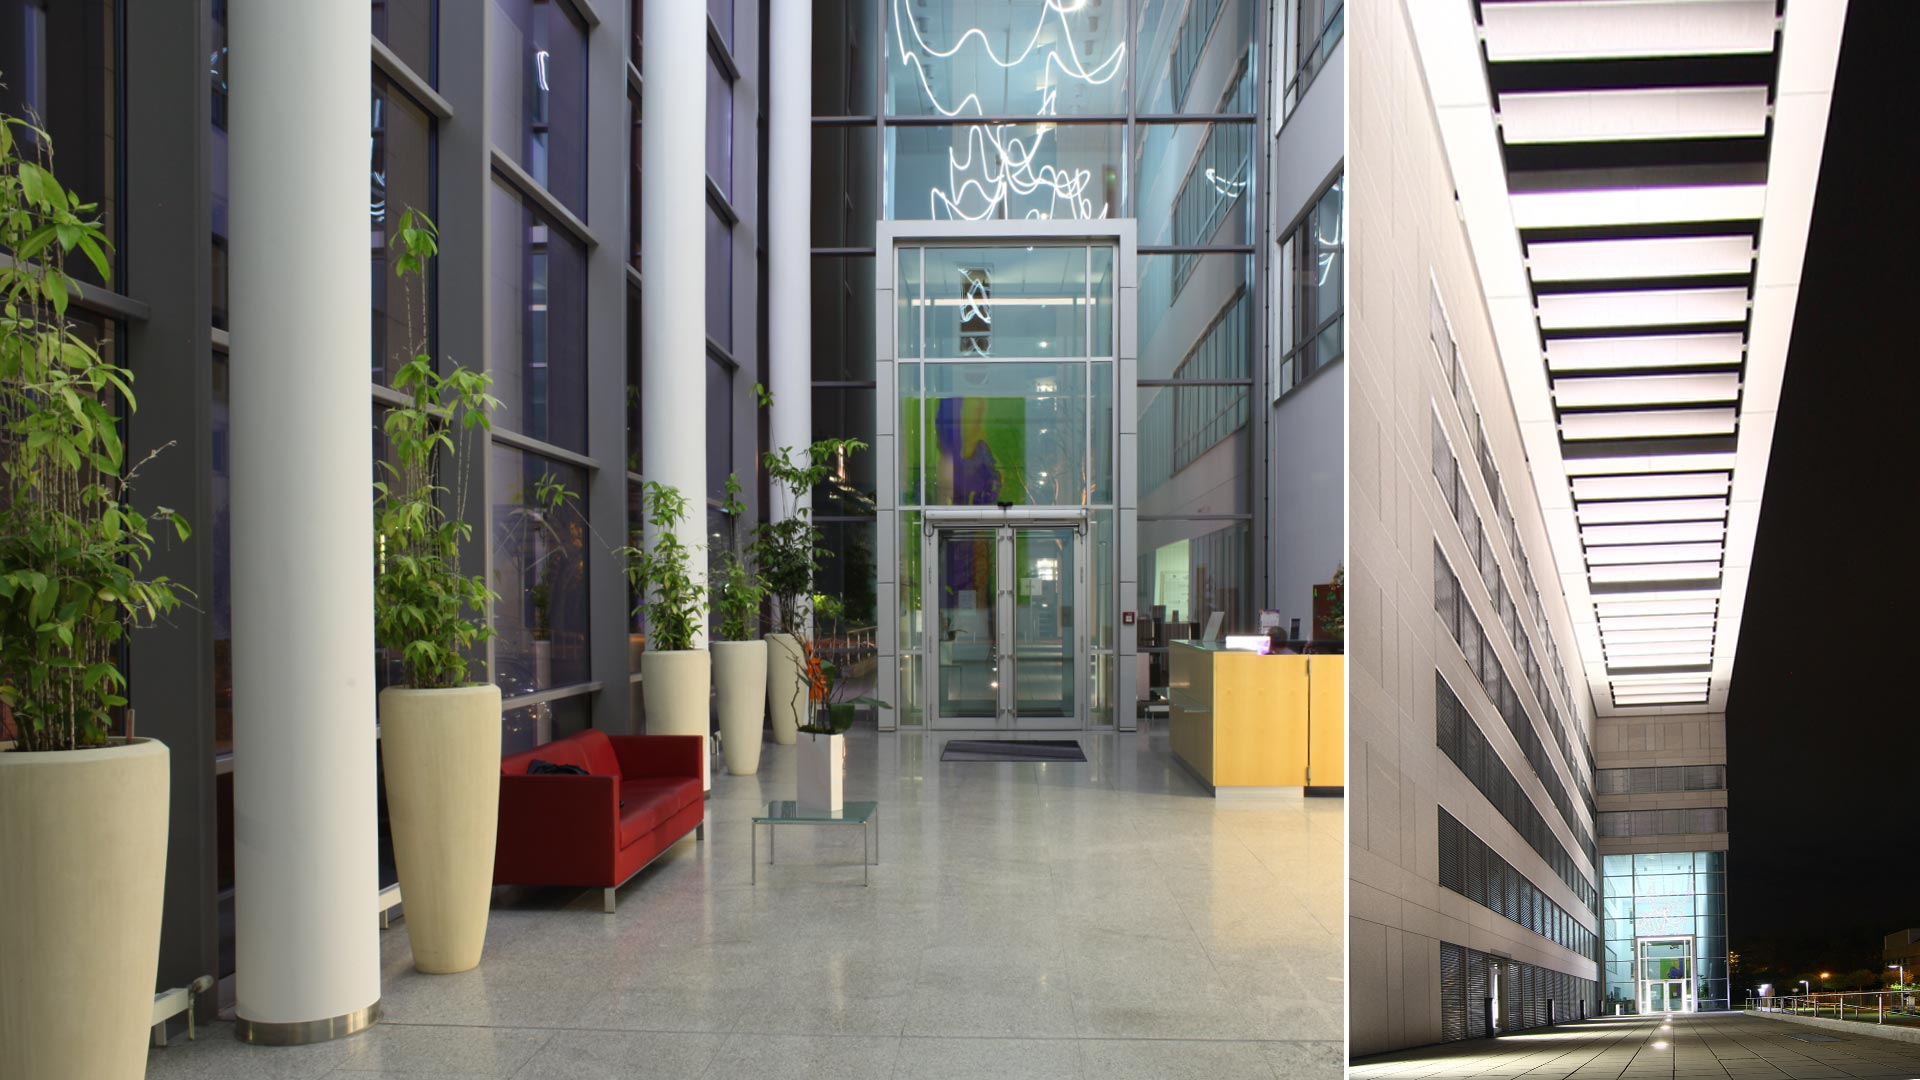 MAASS-Lichtplanung_Leuchtendesign für Foyer eines Bürogebäudes__MAASS-Foyer-Eschborn-003